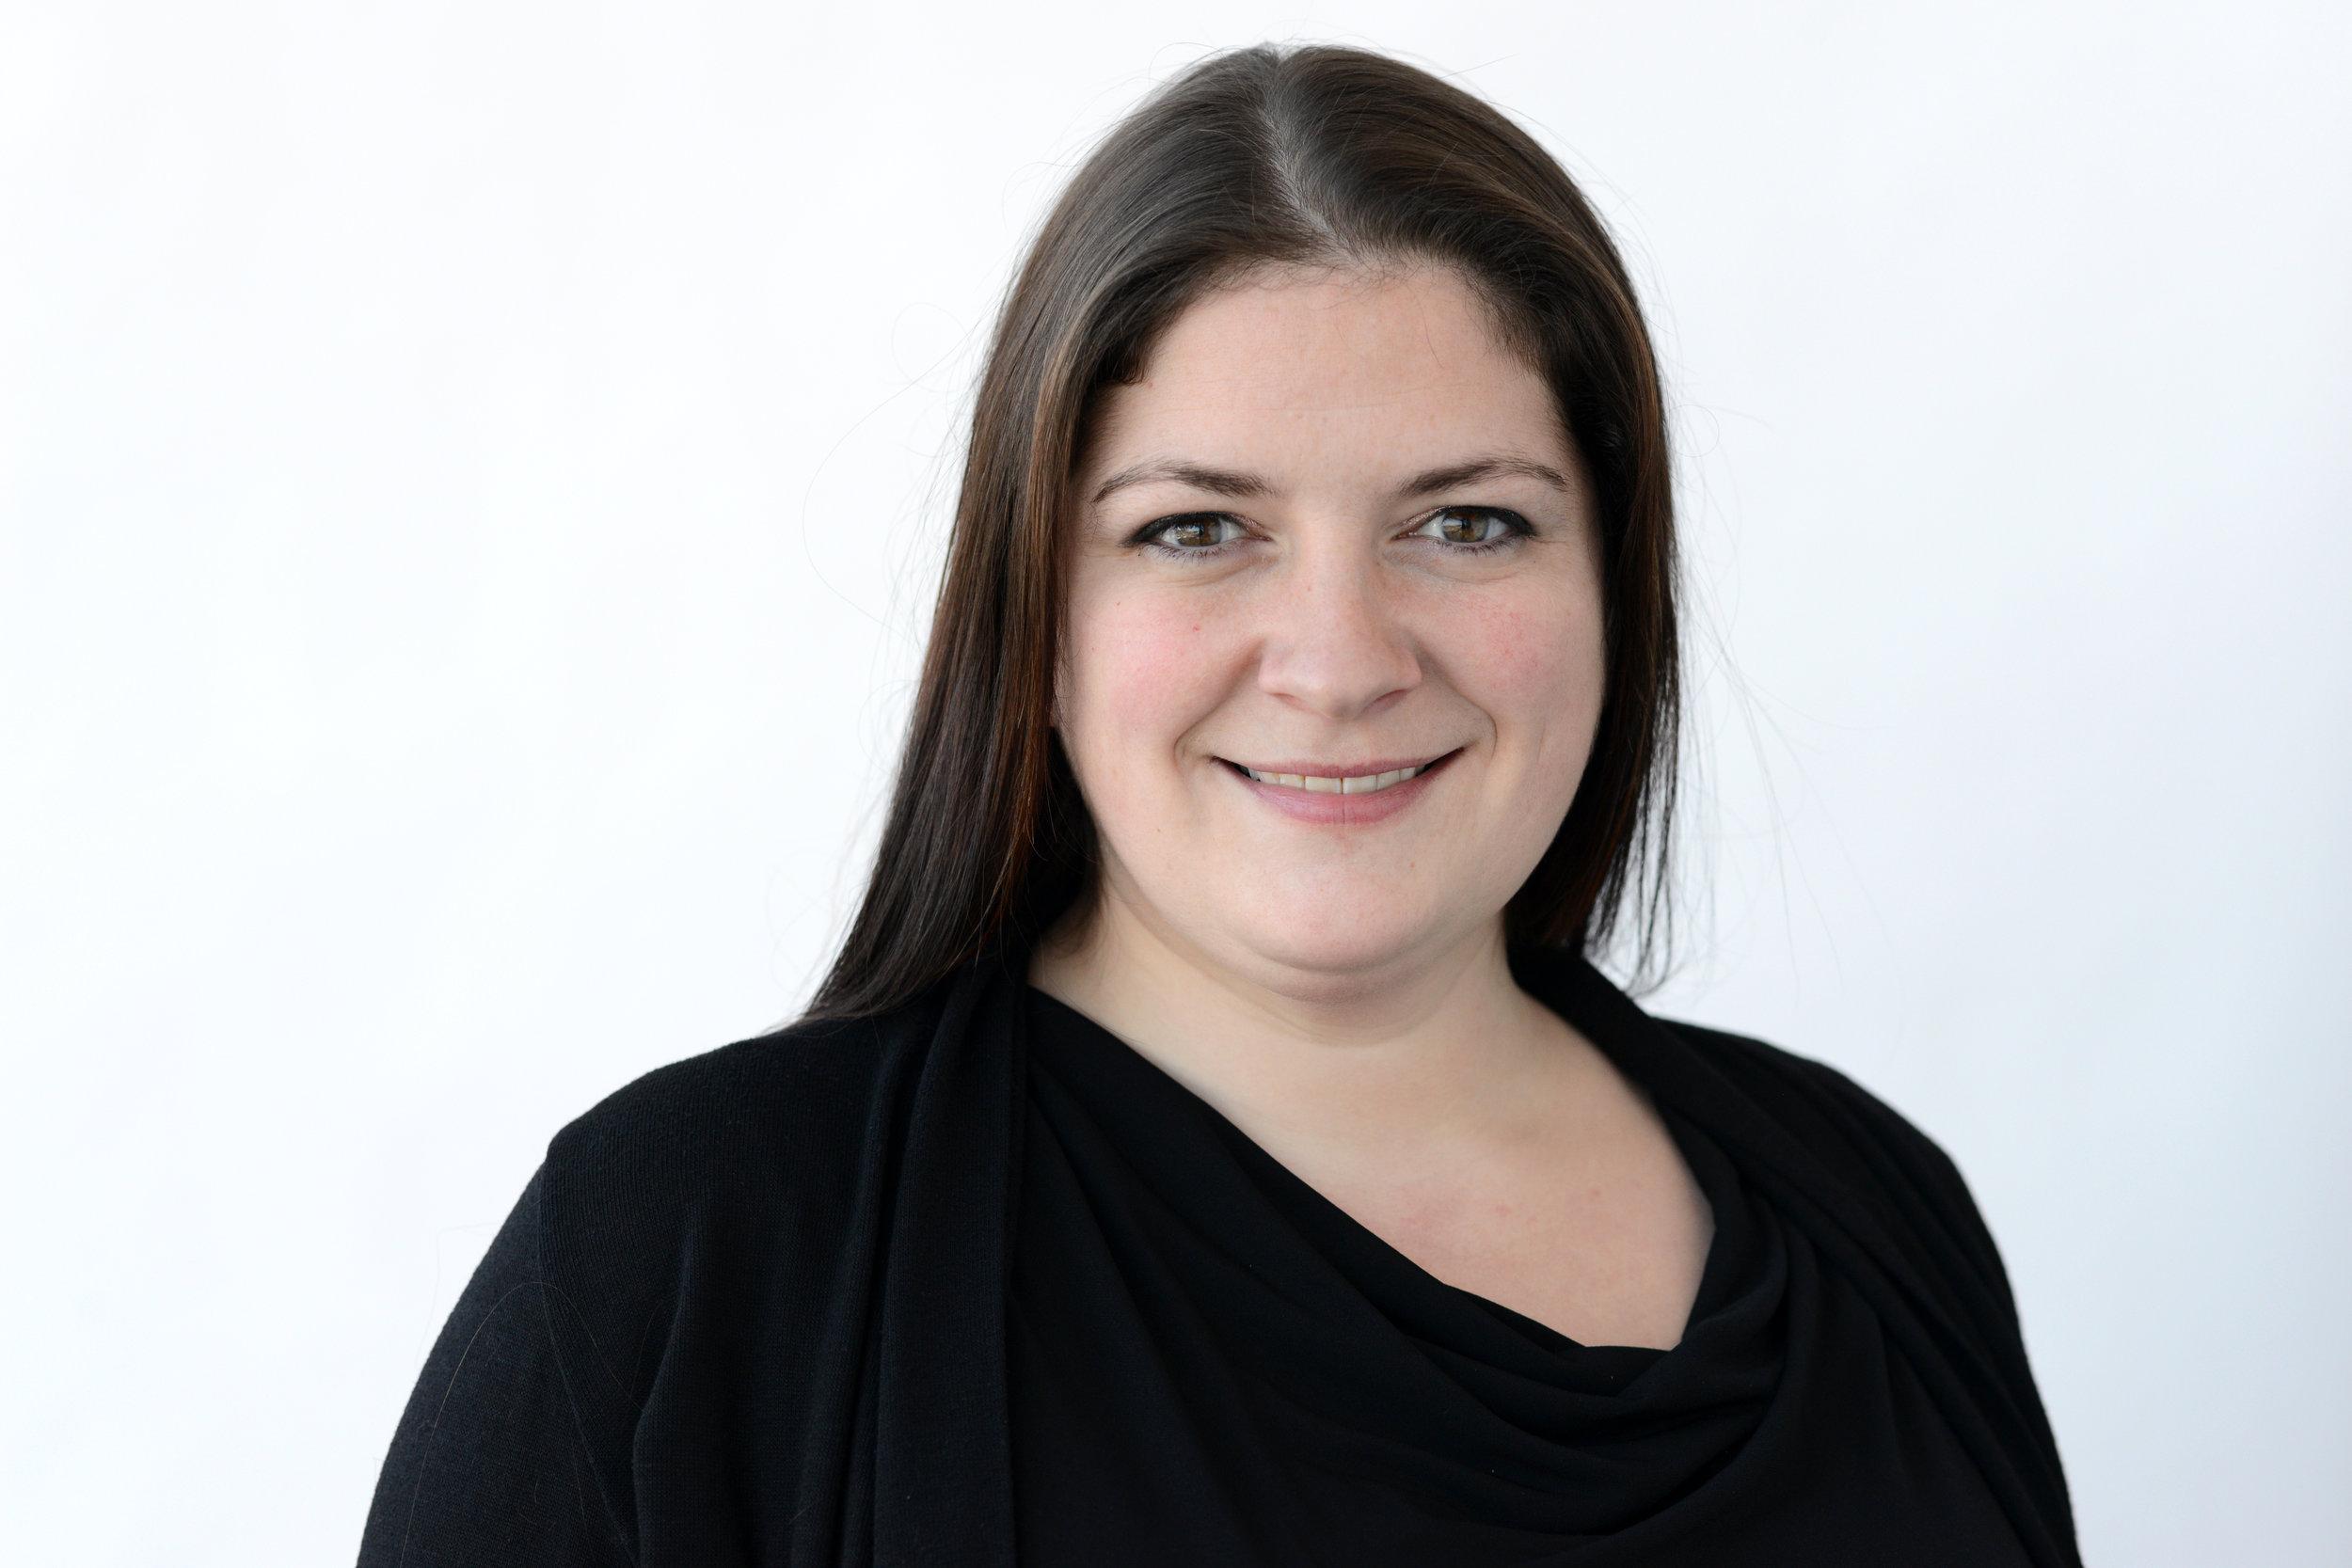 Nicole Ribaudo